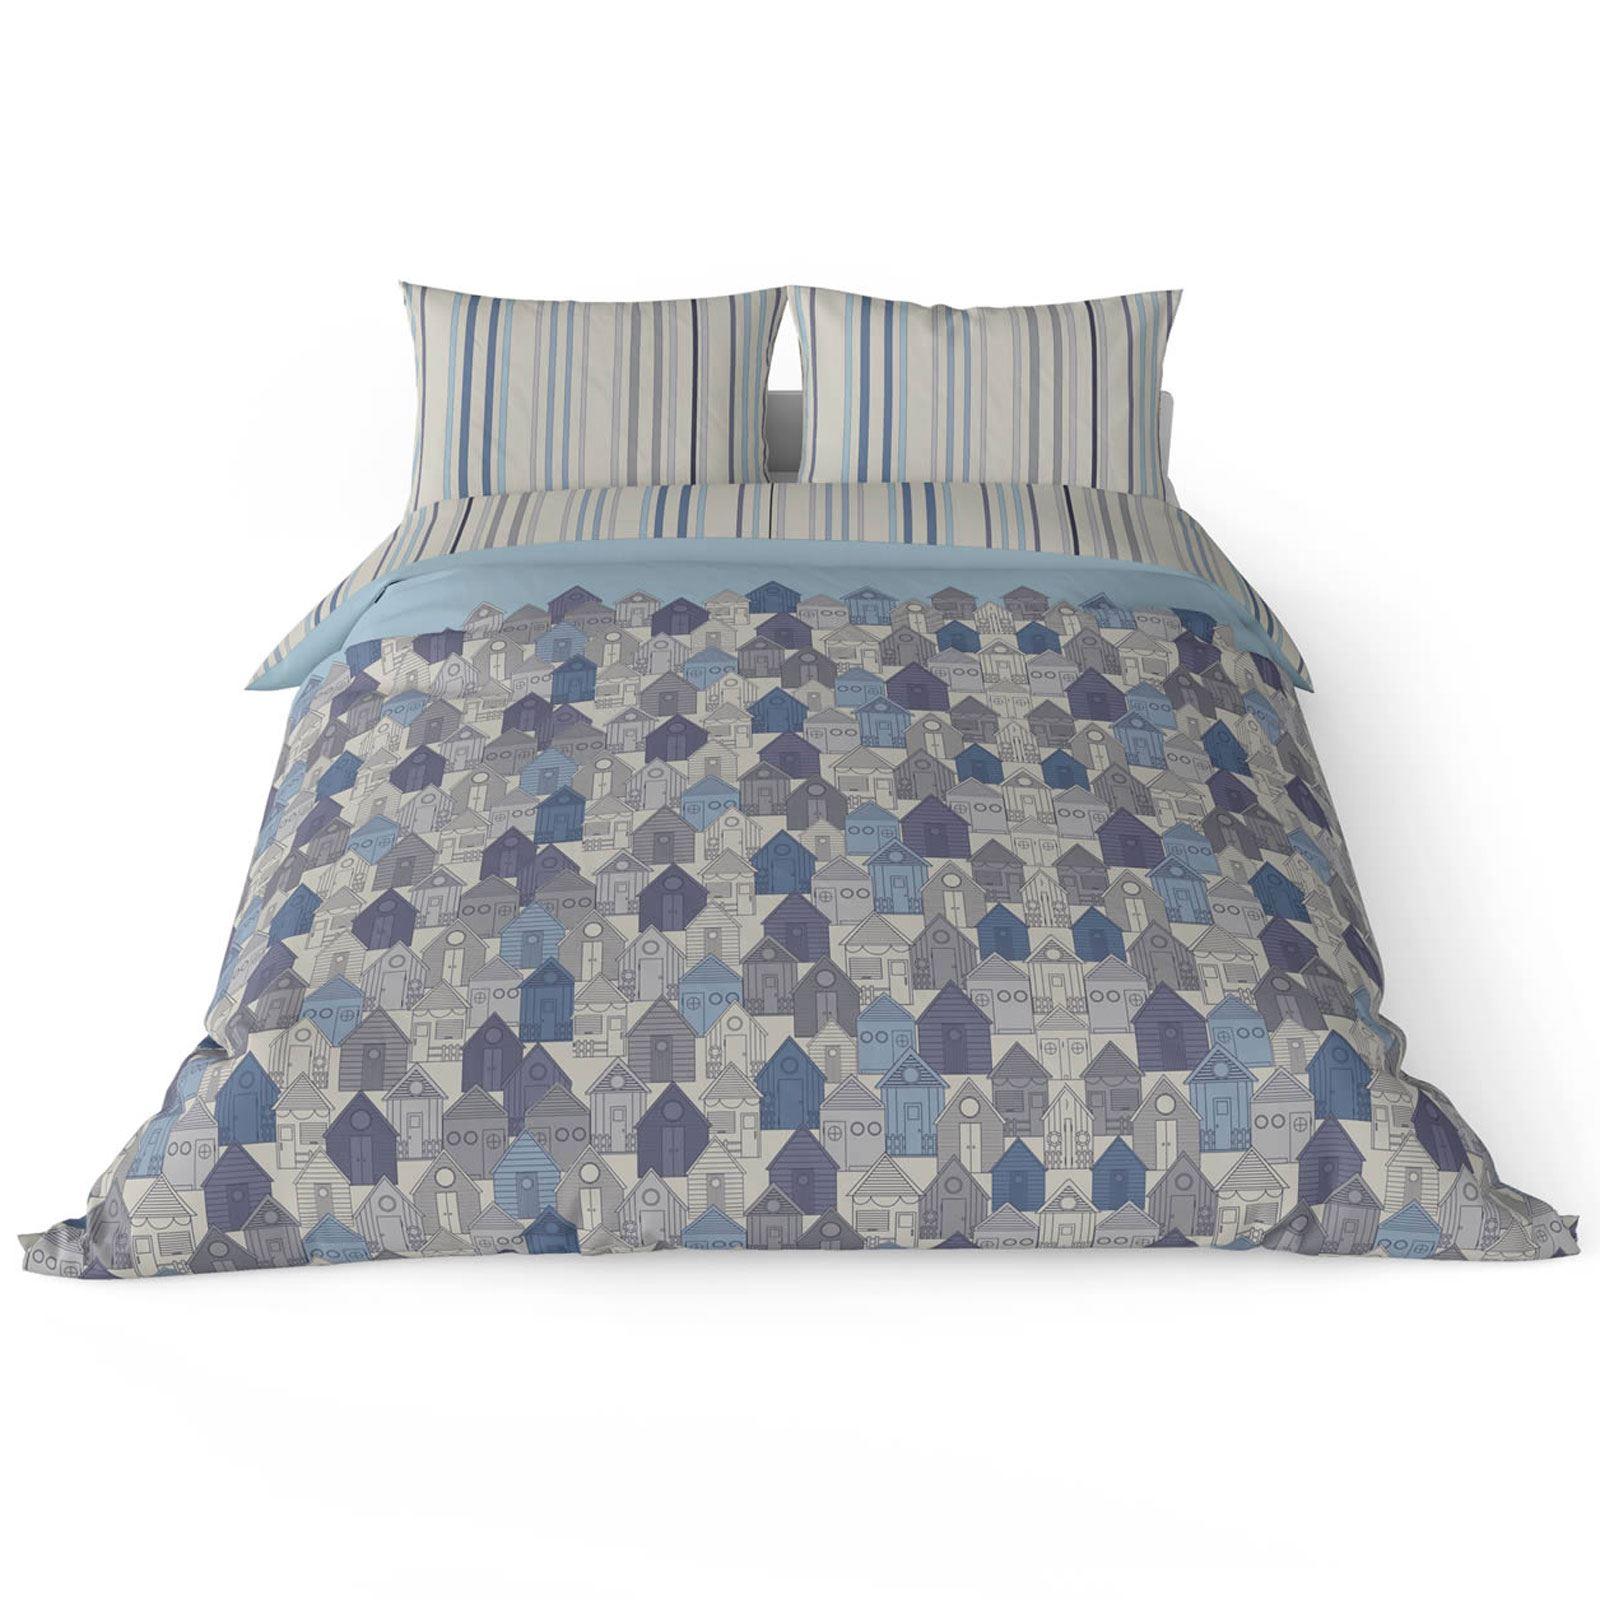 Funda-nordica-azul-azul-marino-verde-azulado-edredon-algodon-estampado-juego-conjuntos-de-cama-cubre miniatura 48